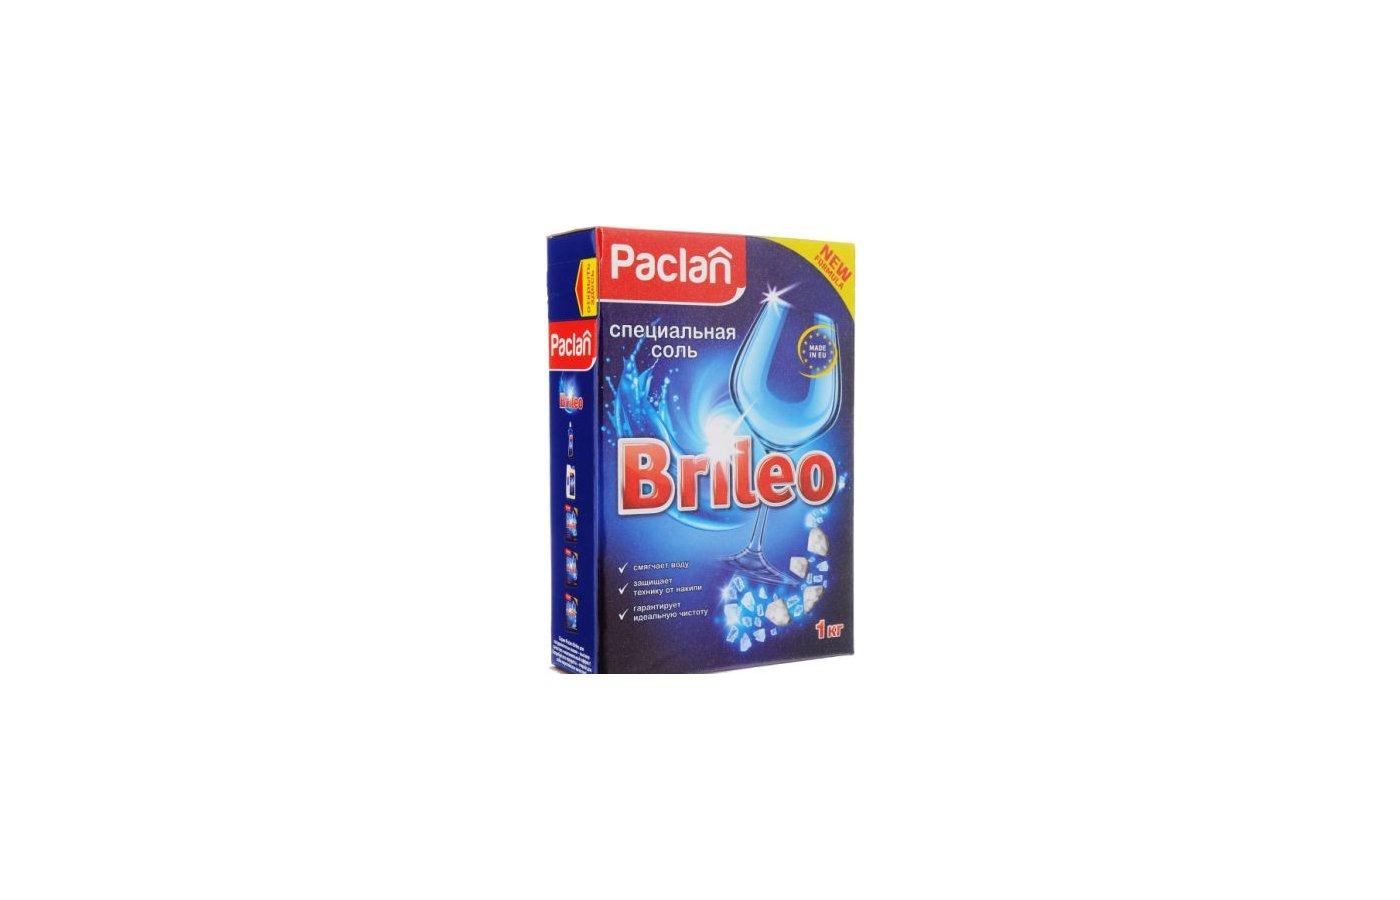 Соль для ПММ PACLAN 419150 BRILEO 1кг